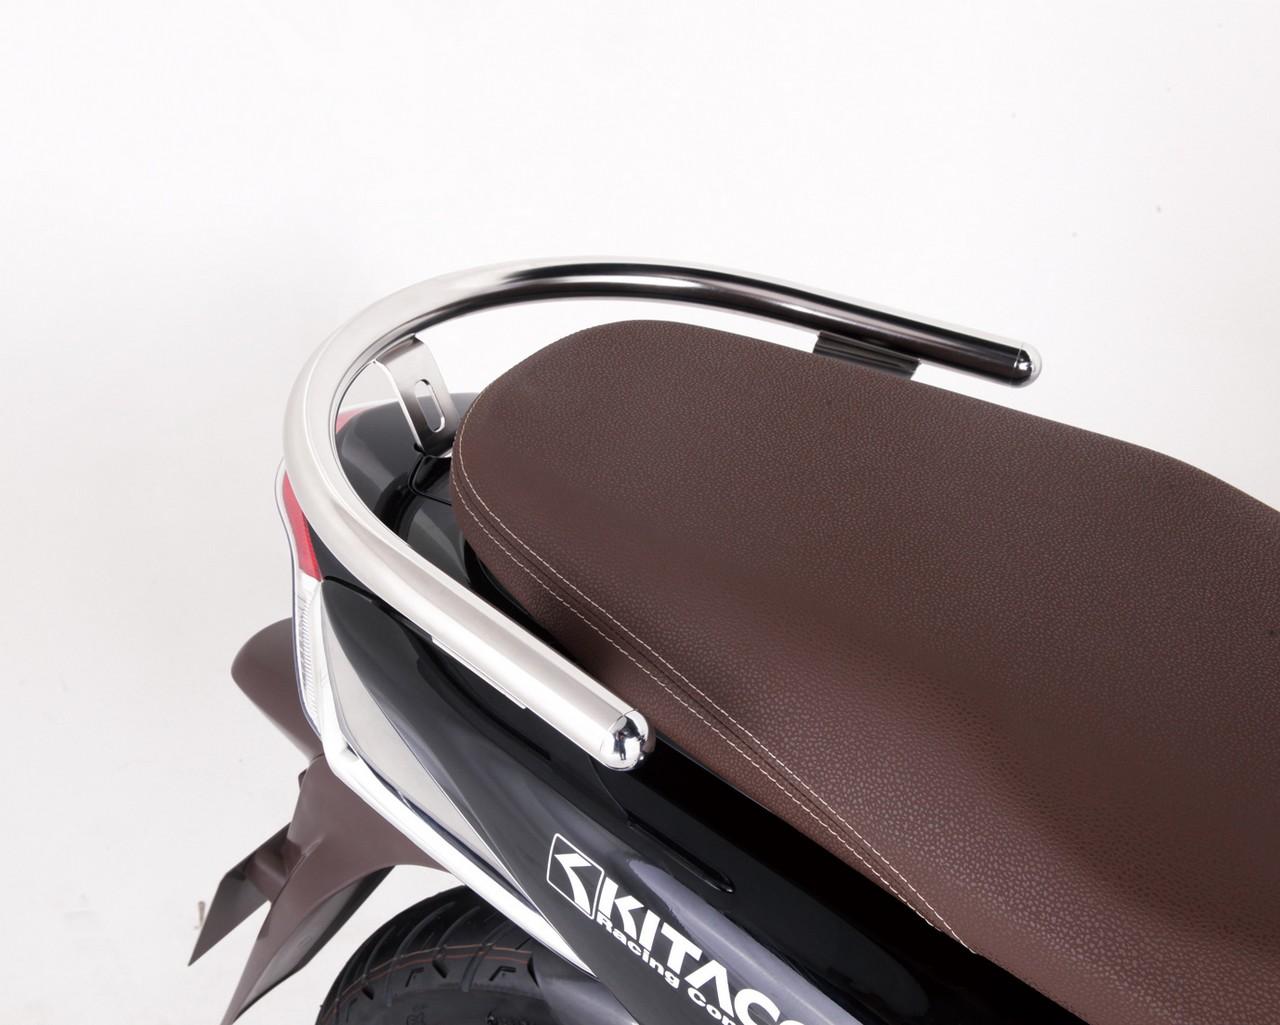 【KITACO】Fashion後扶手 - 「Webike-摩托百貨」